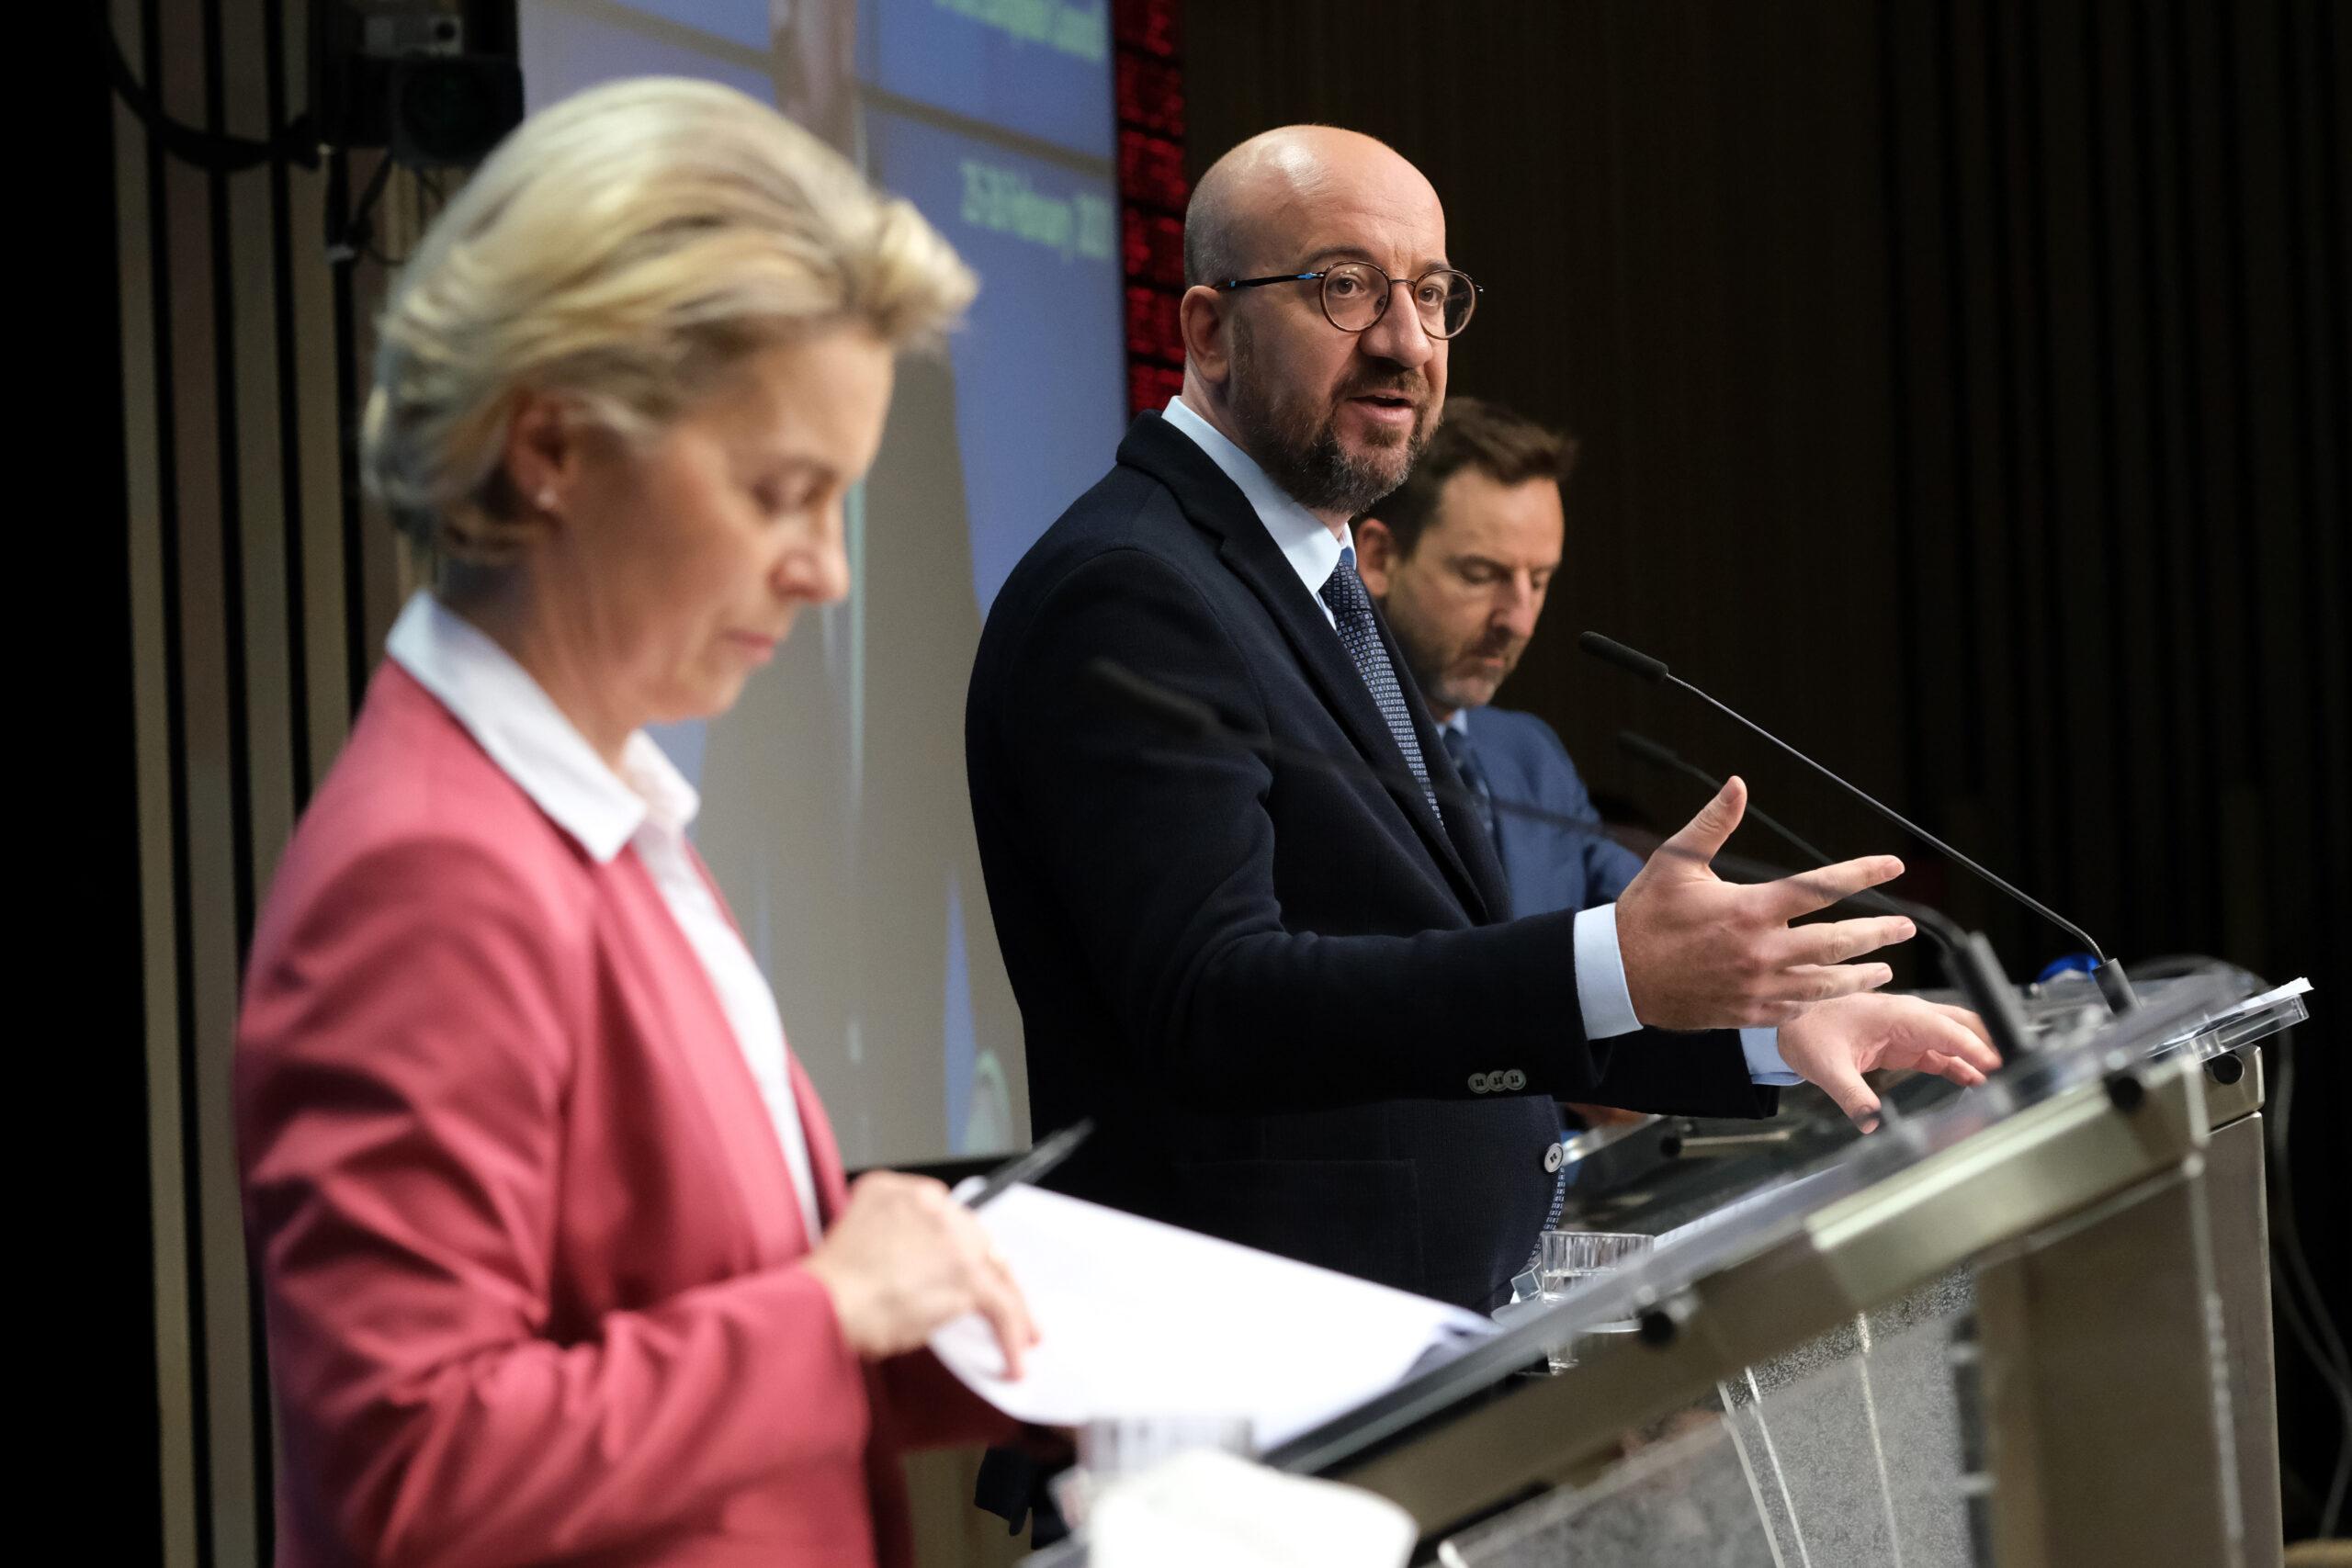 La presidenta de la Comissió, Ursula von der Leyen, i del president del Consell, Charles Michel | ACN